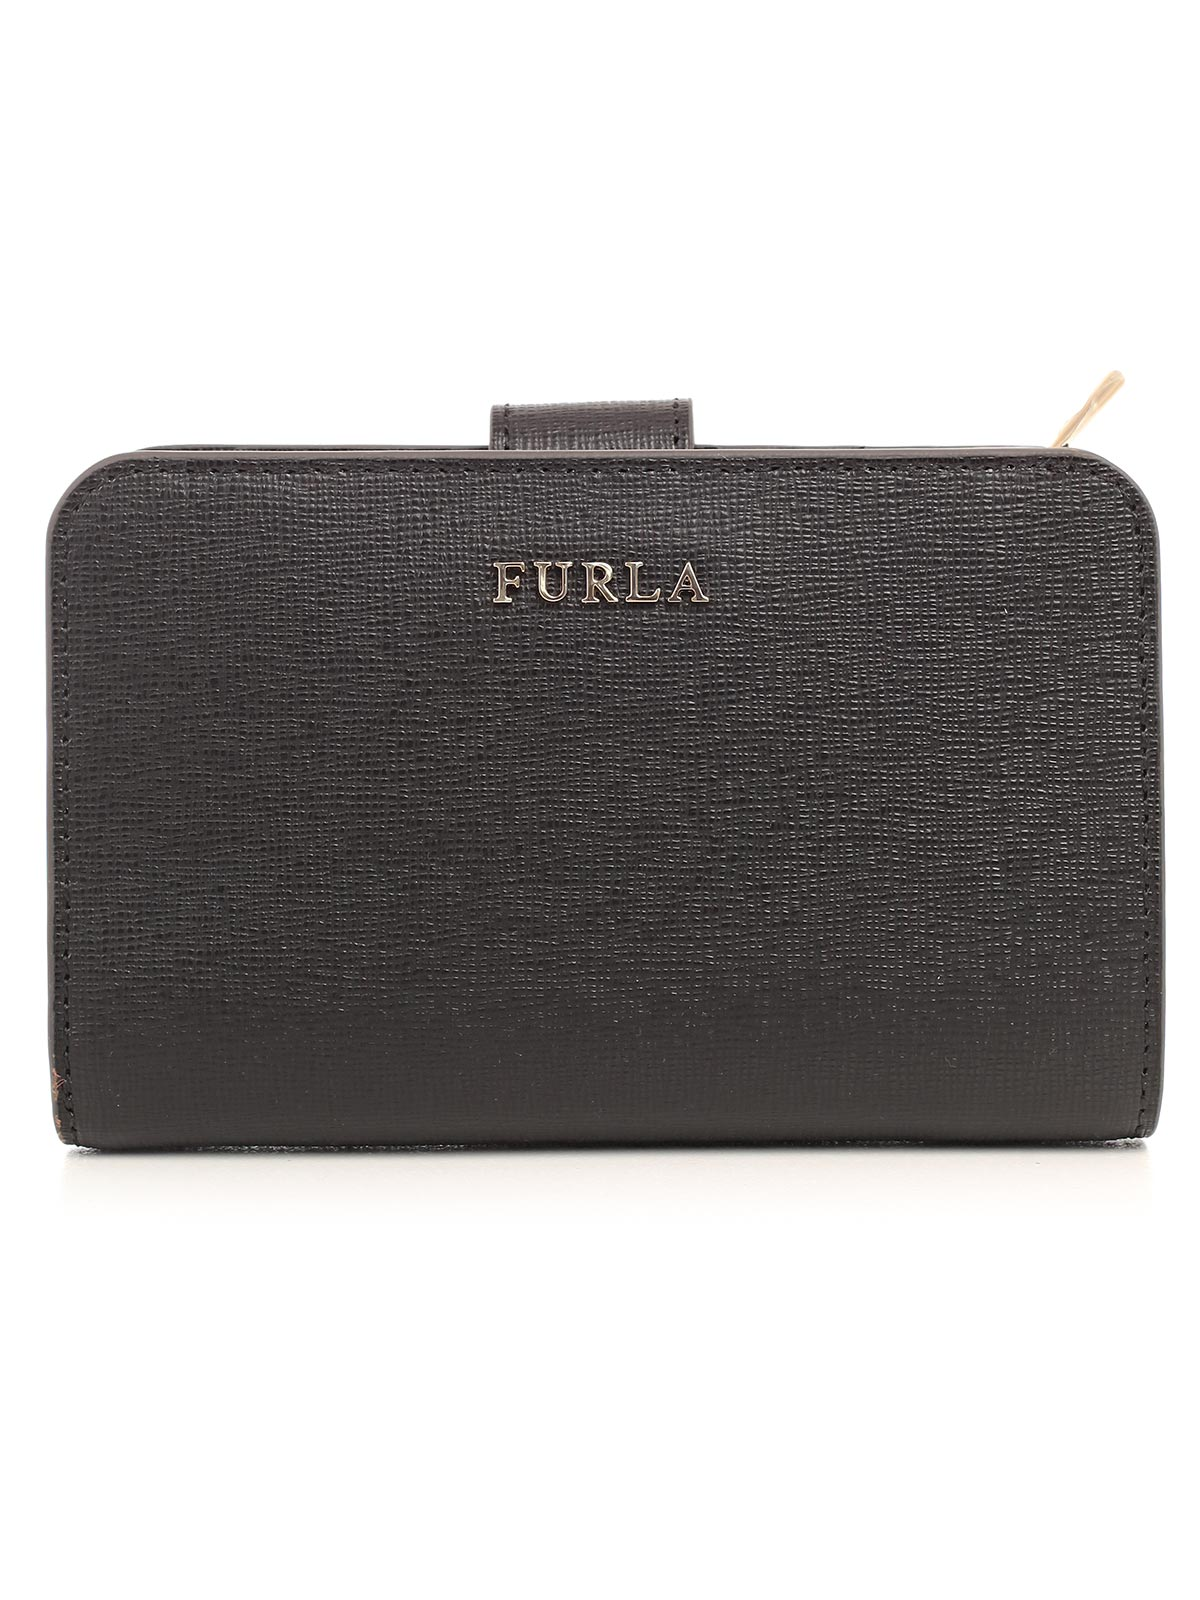 Picture of Furla Wallets & Purses